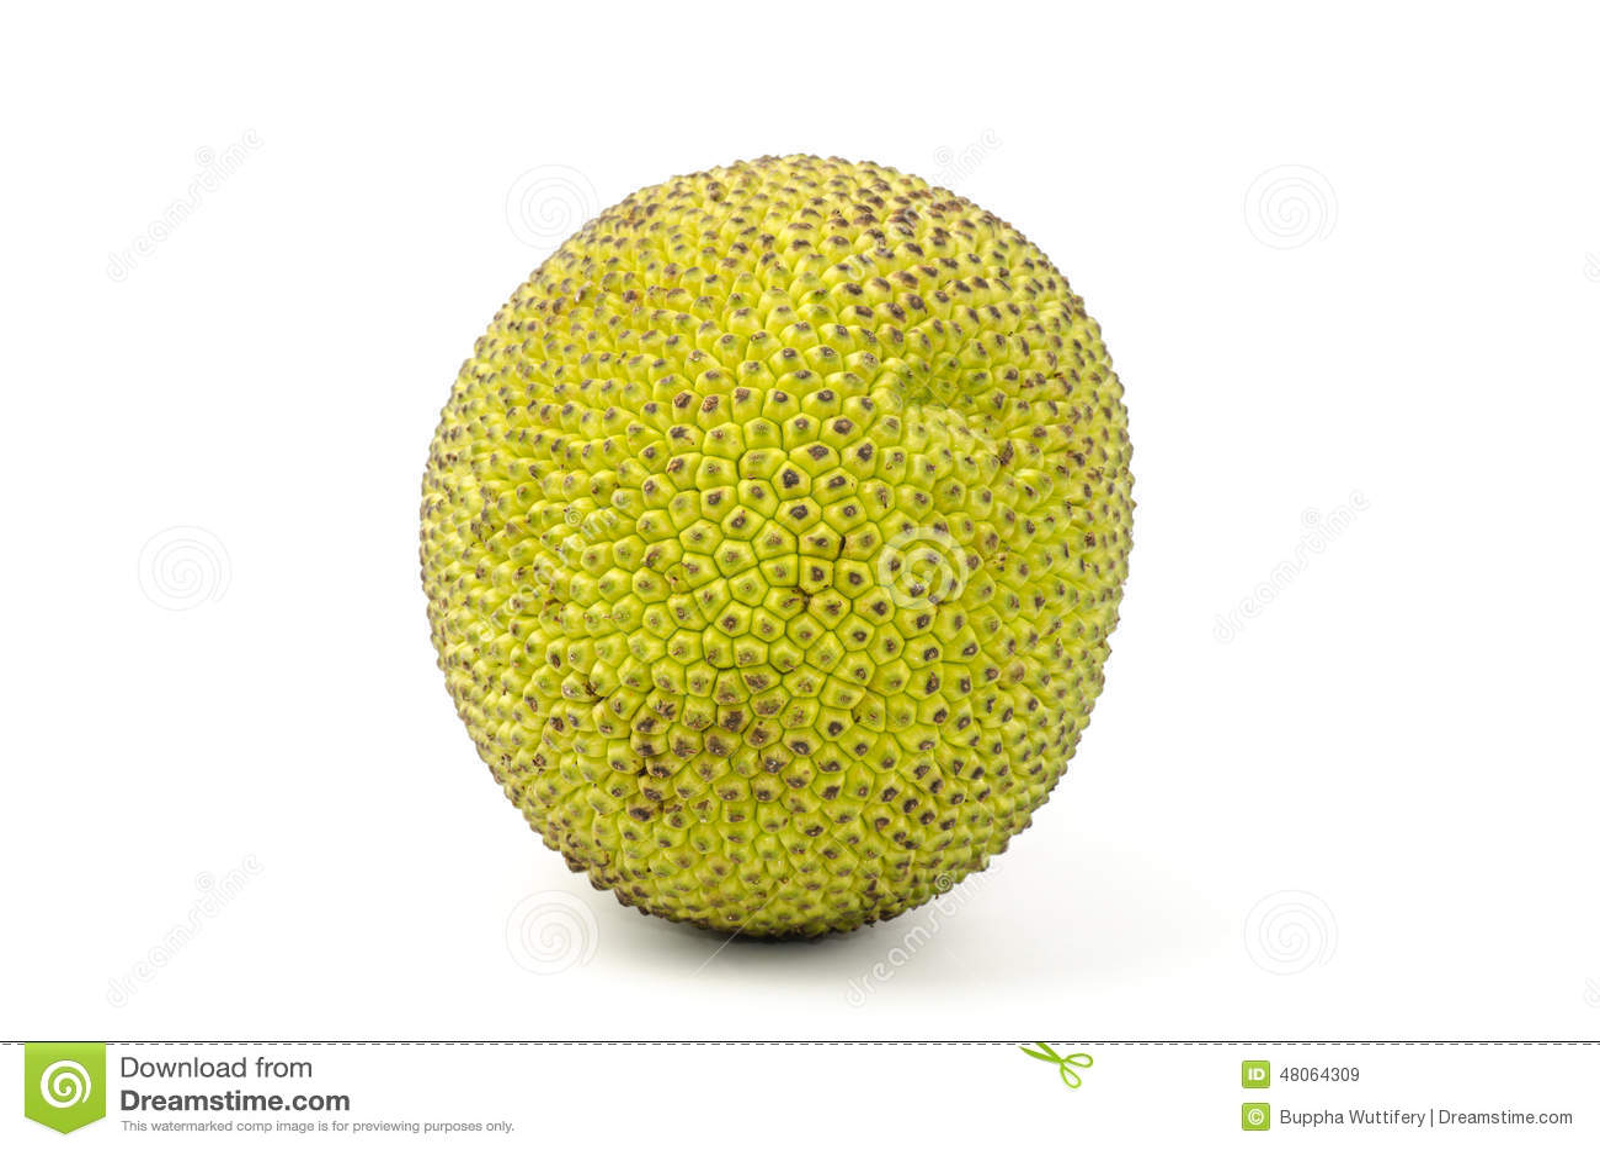 how to clean raw jackfruit